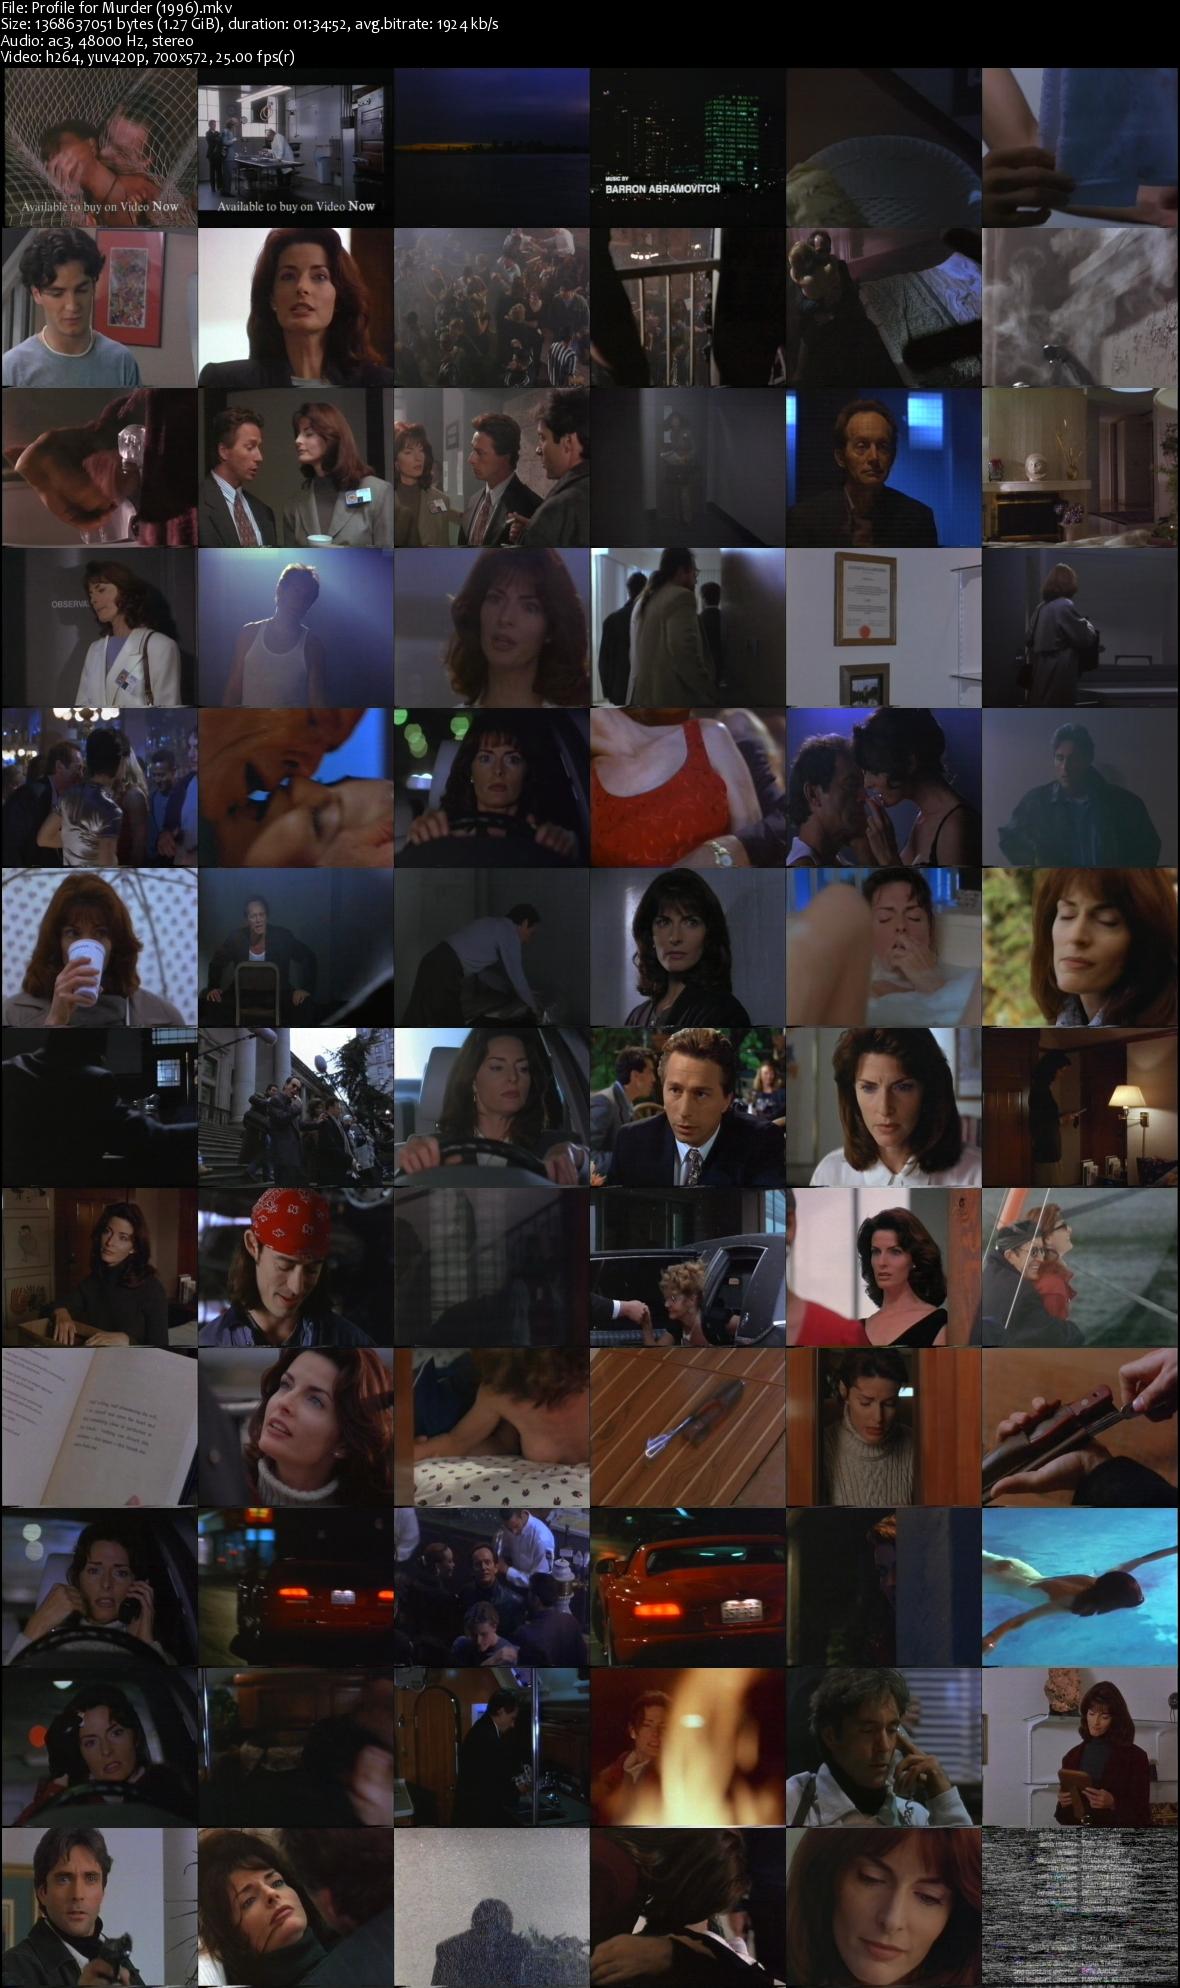 Joan Severance Sex Movies profile for murder (1996) vhsrip [1.27gb]